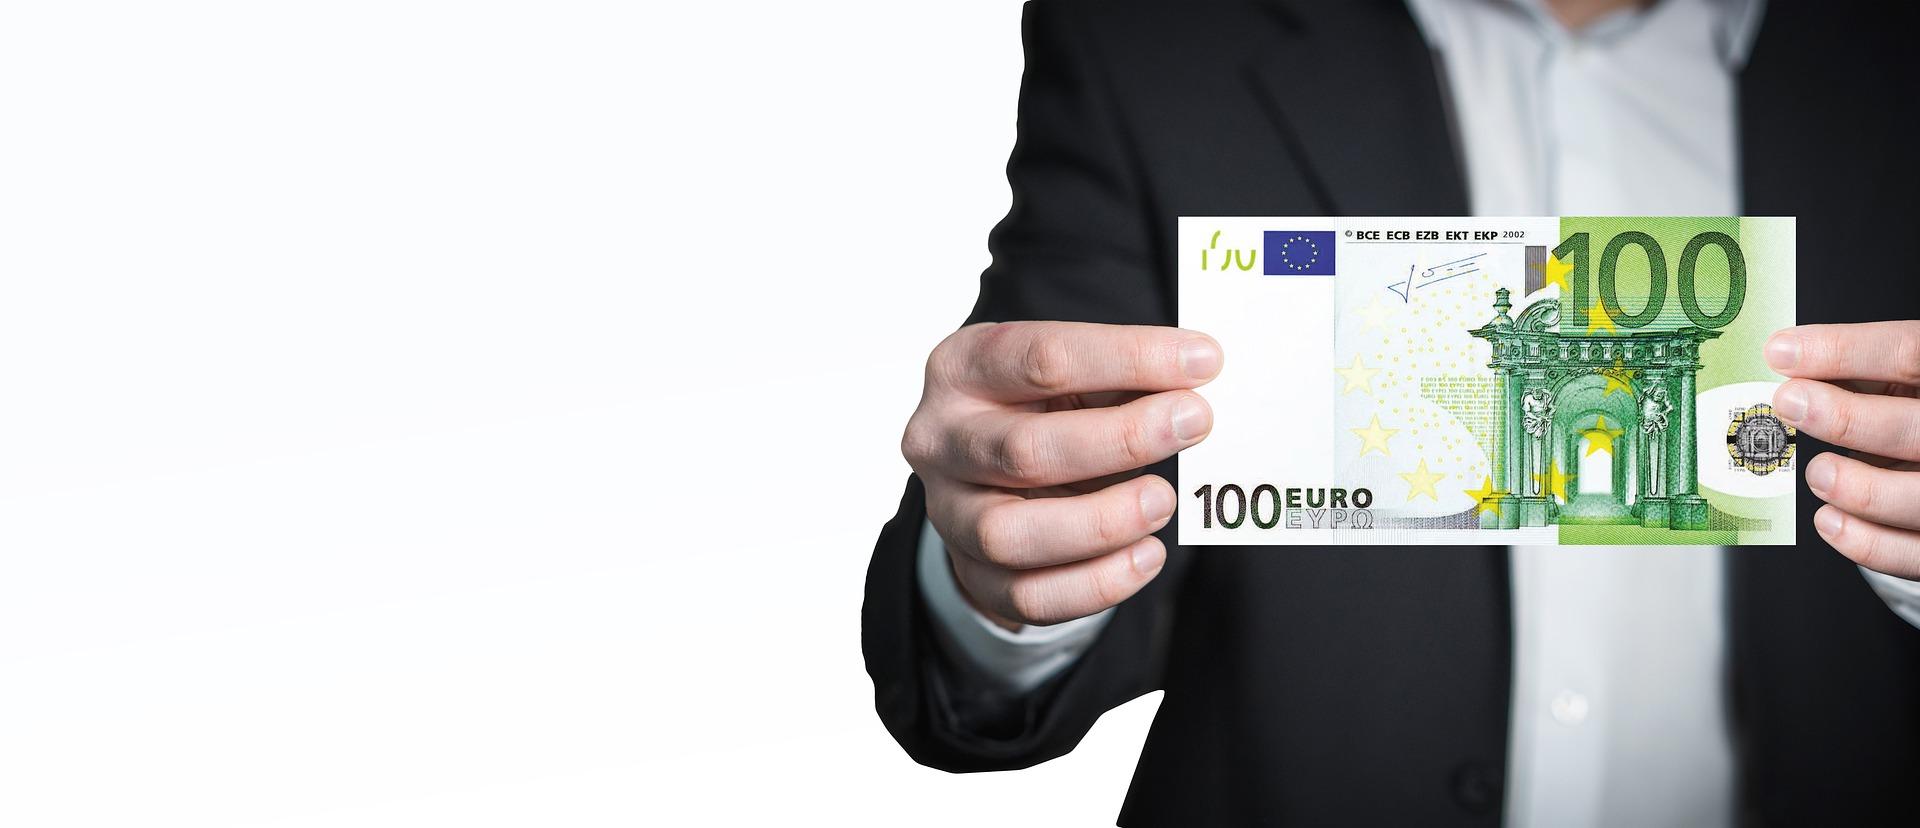 credit repair scams avoid